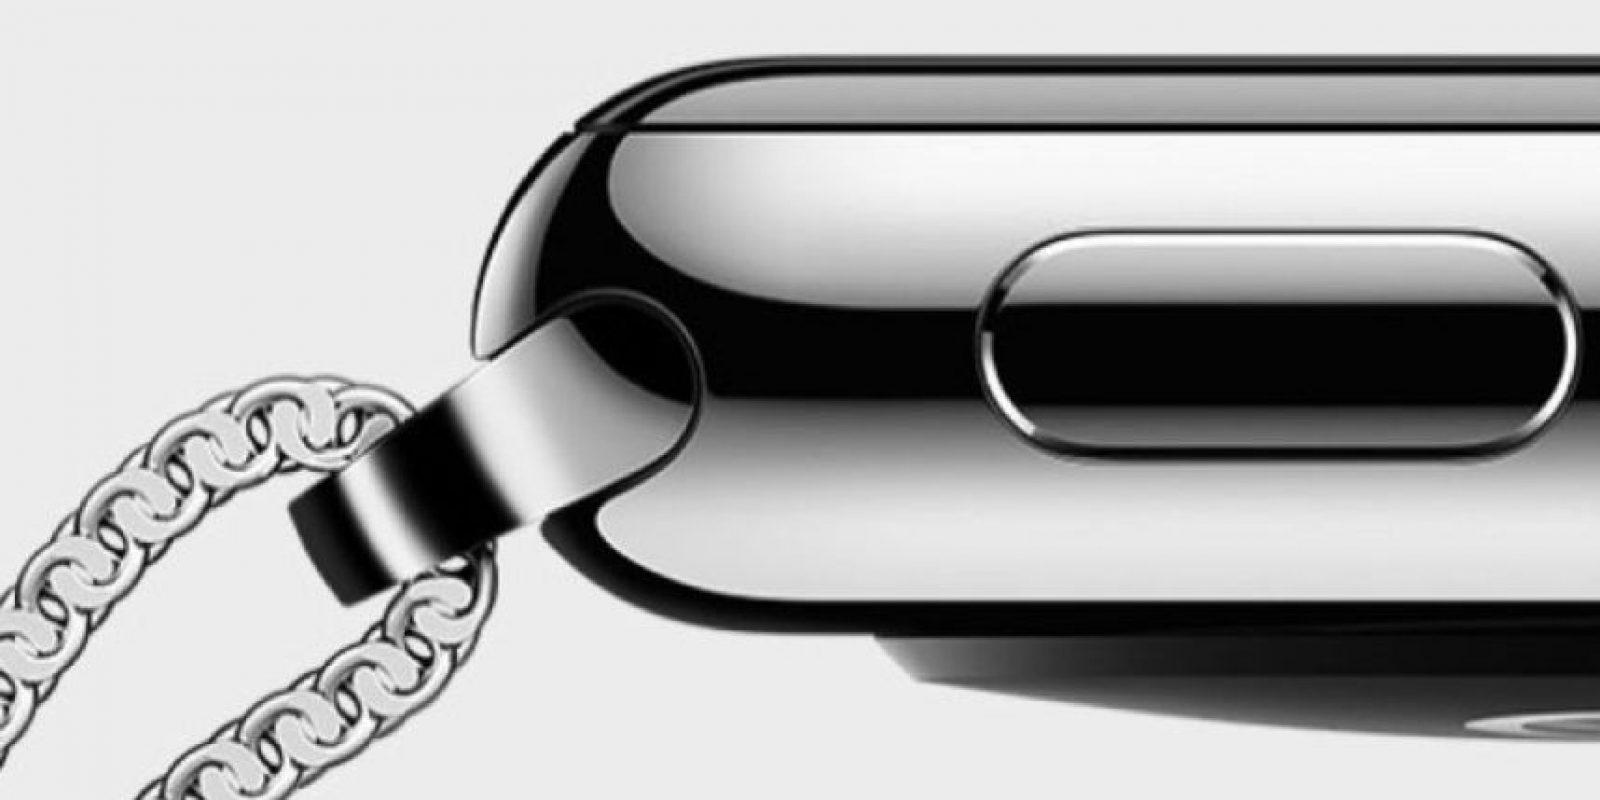 Tendrá una pantalla de zafiro con caja de 38*42mm. Foto:Apple